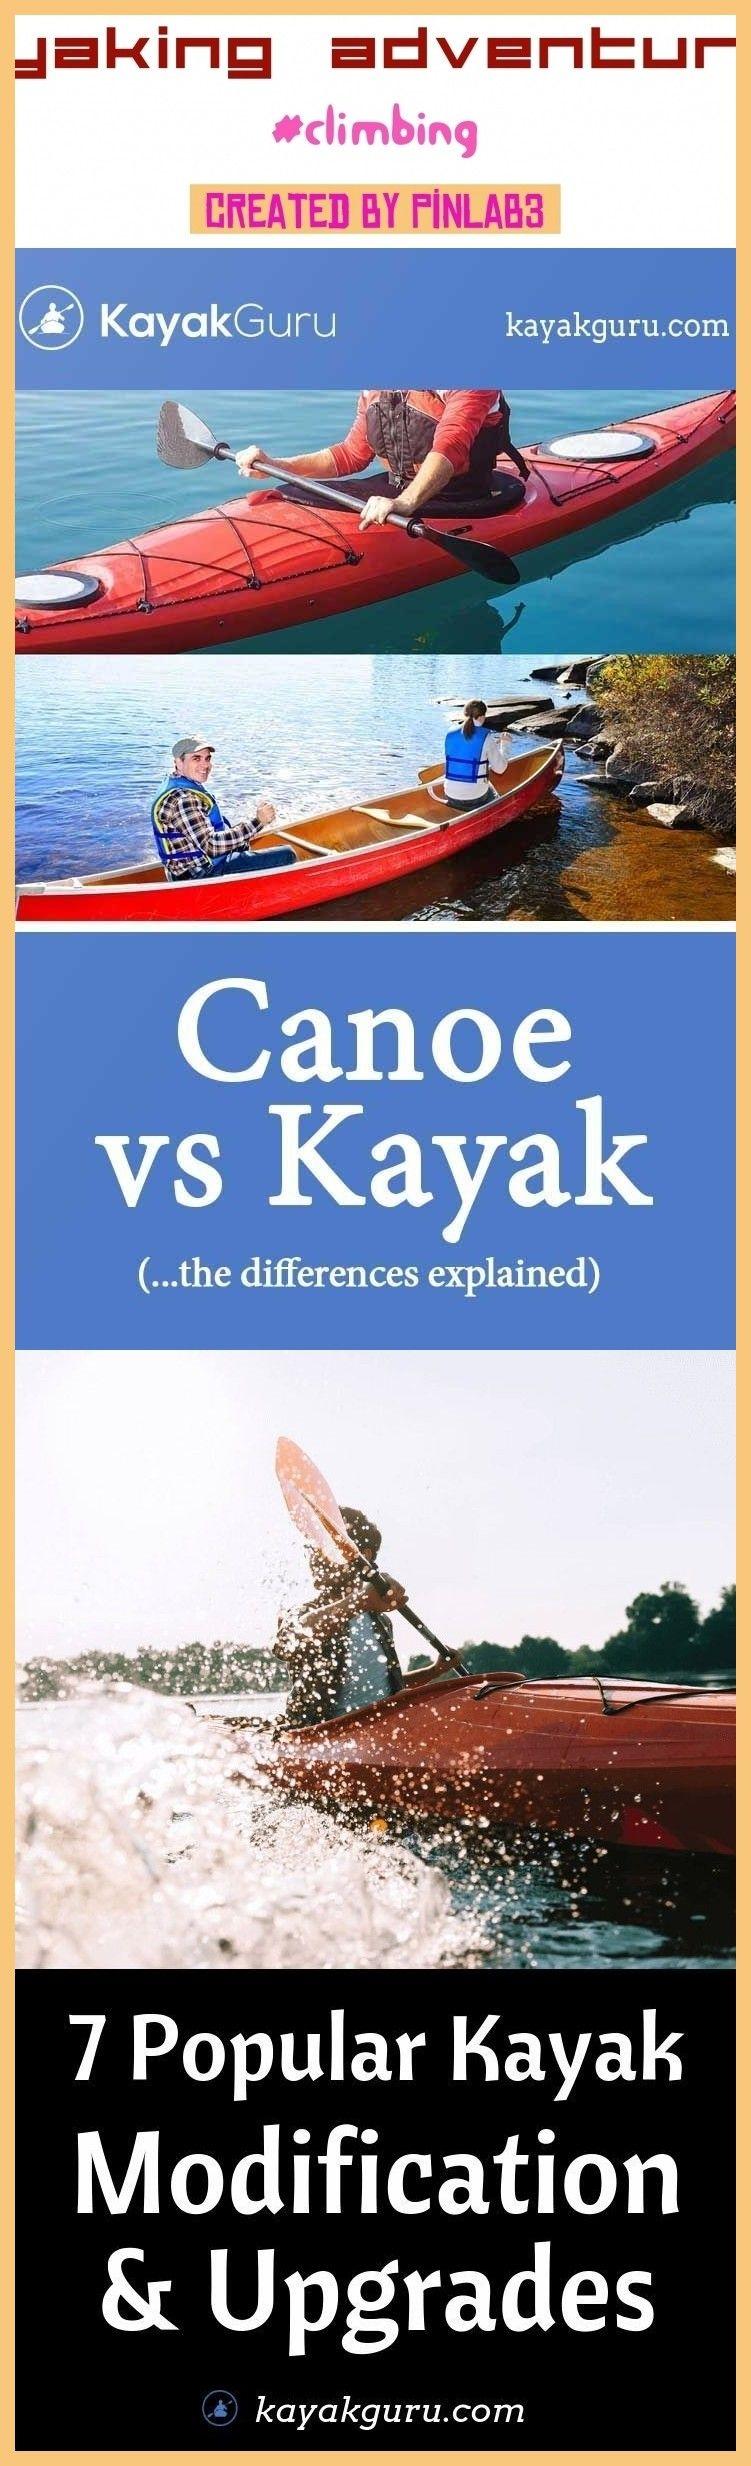 Kayaking Adventures Kayak Adventures Kayaking Adventure